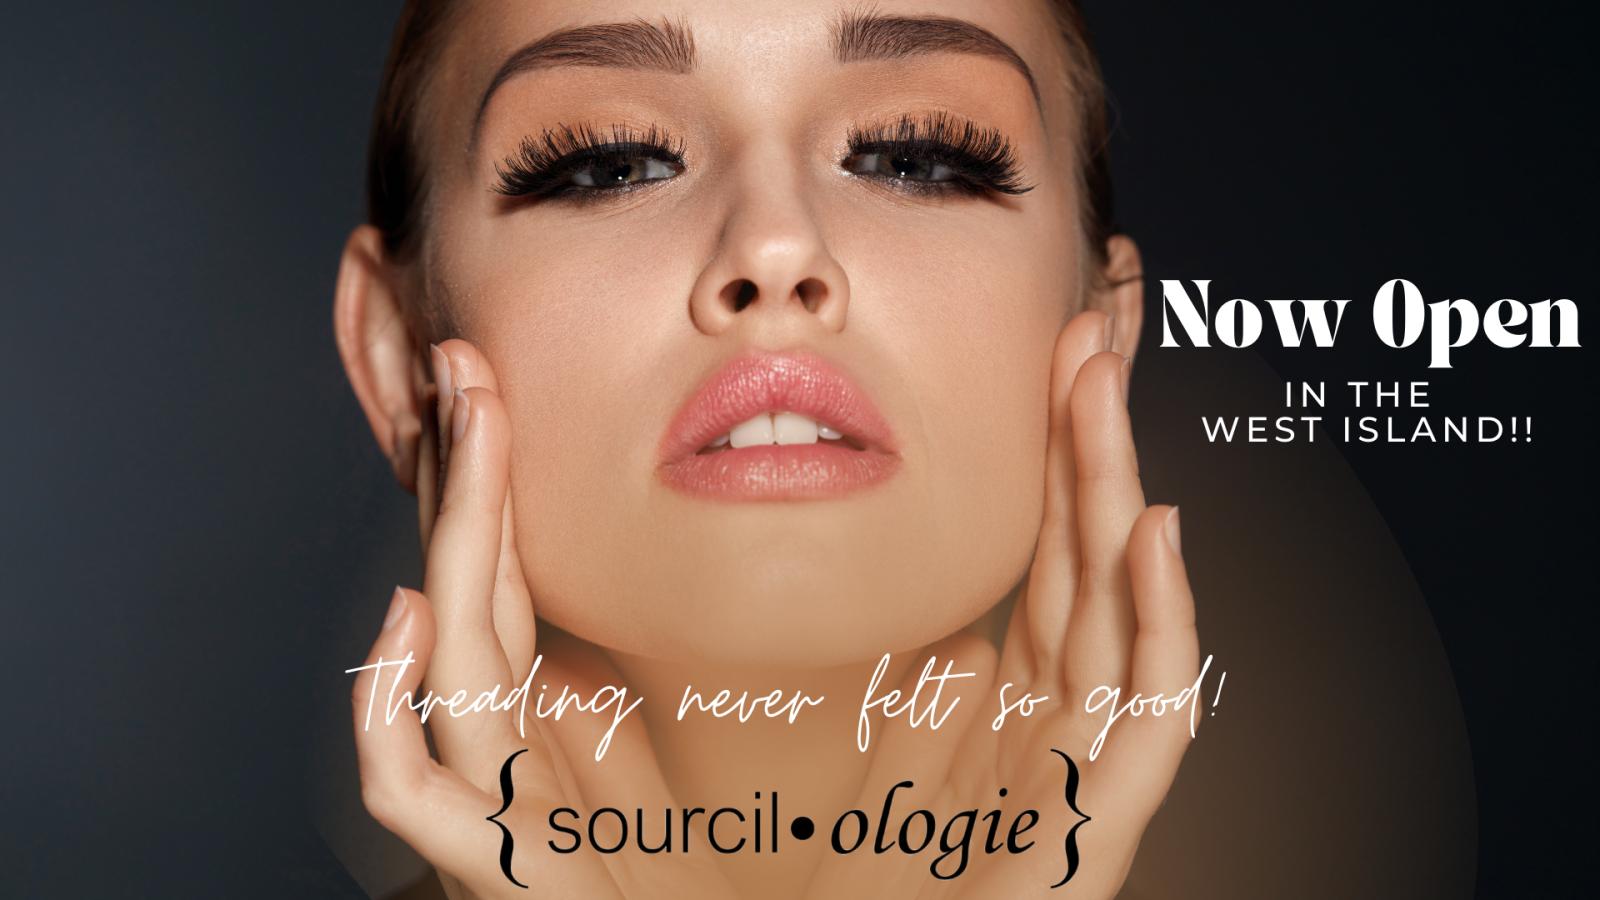 sourcil•ologie is now open